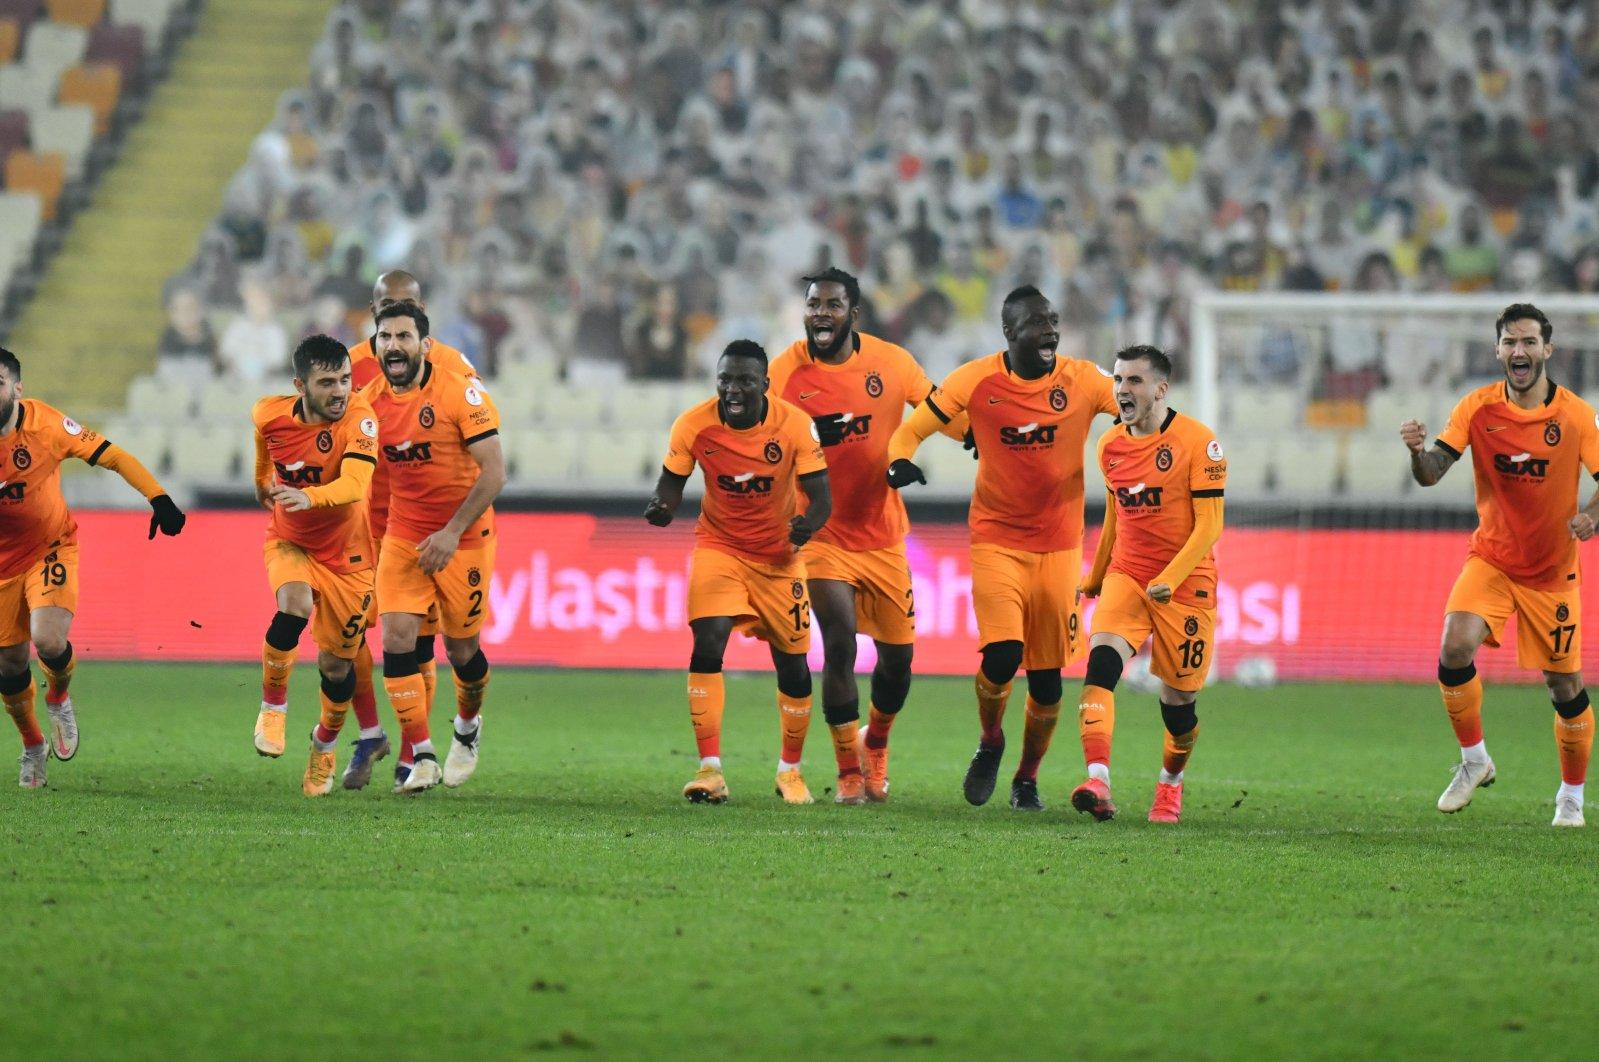 Galatasaray footballers celebrate after reaching the Ziraat Turkish Cup quarterfinals after defeating Yeni Malatyaspor, Malatya, eastern Turkey, Jan. 12, 2020. (AA Photo)